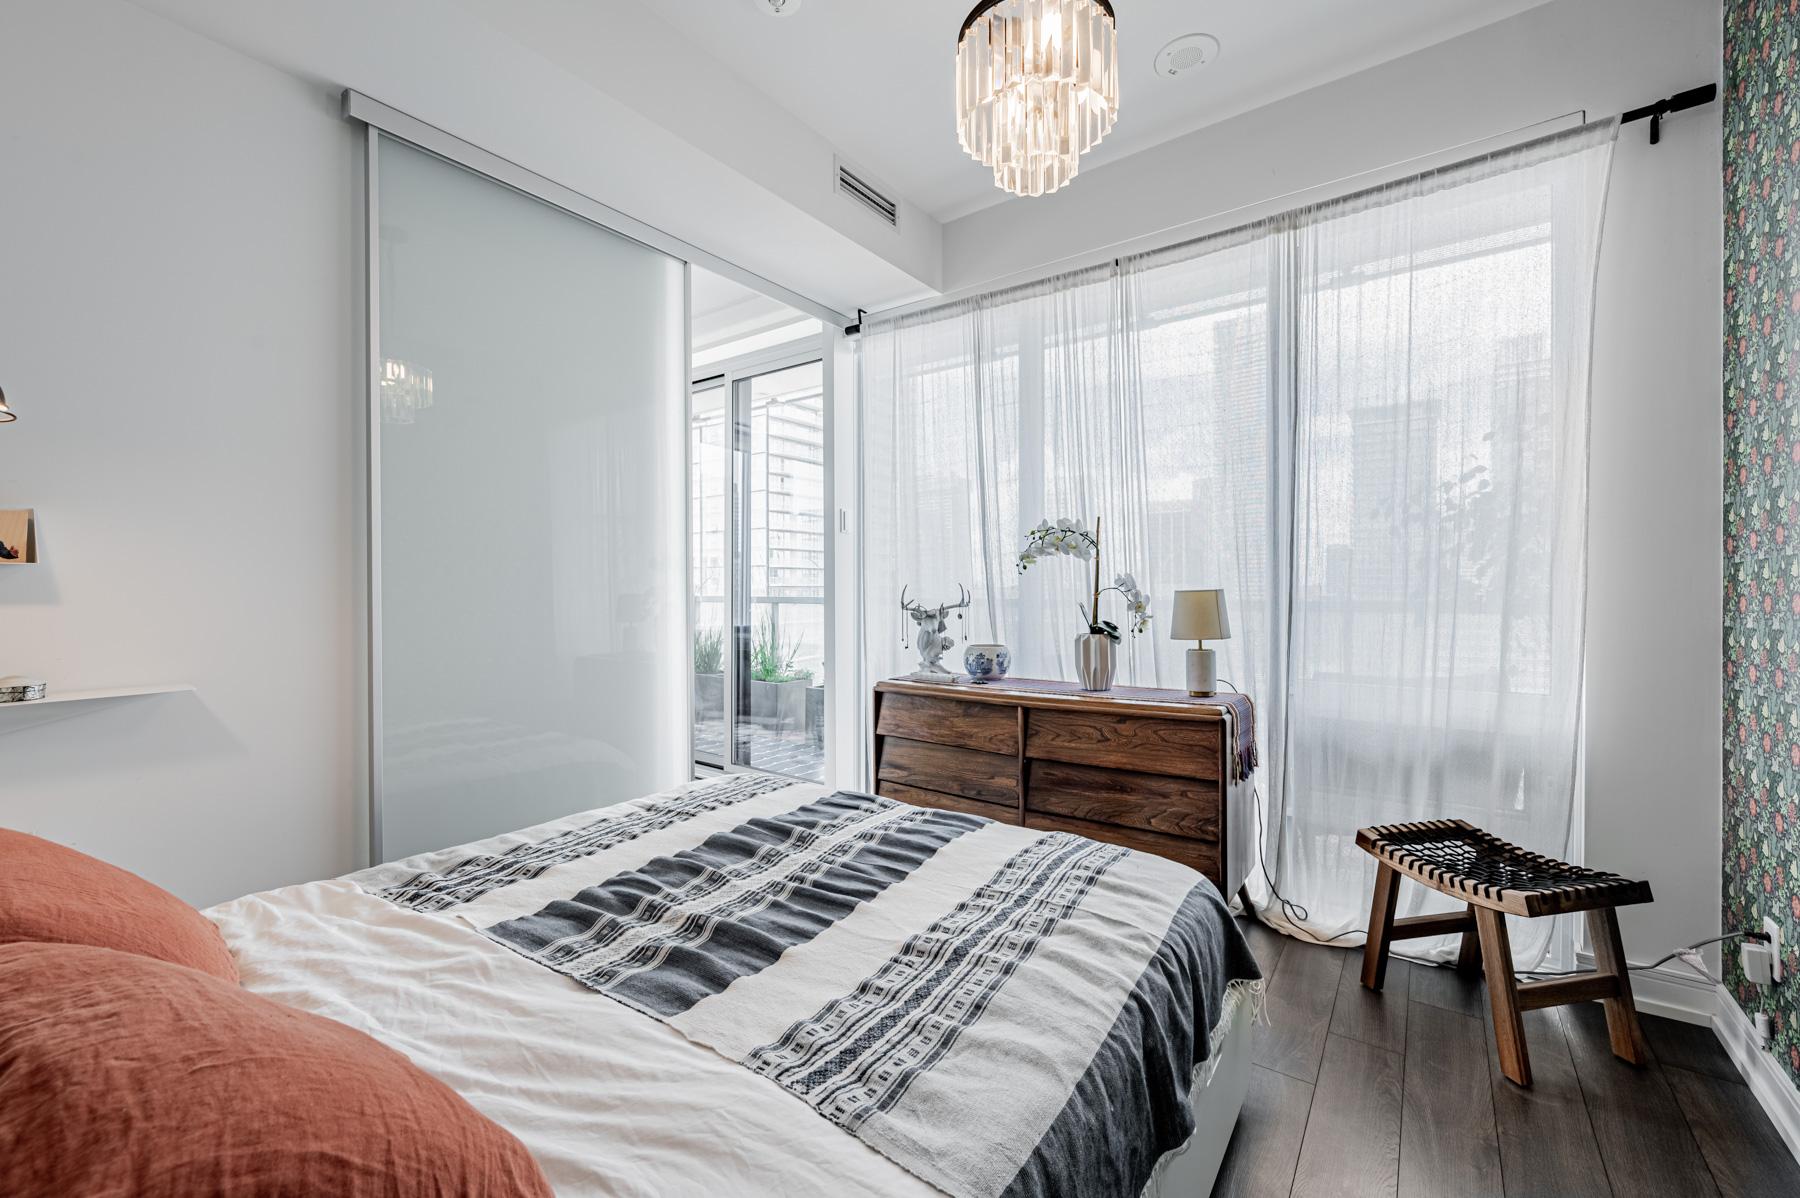 Condo bedroom overlooking balcony.